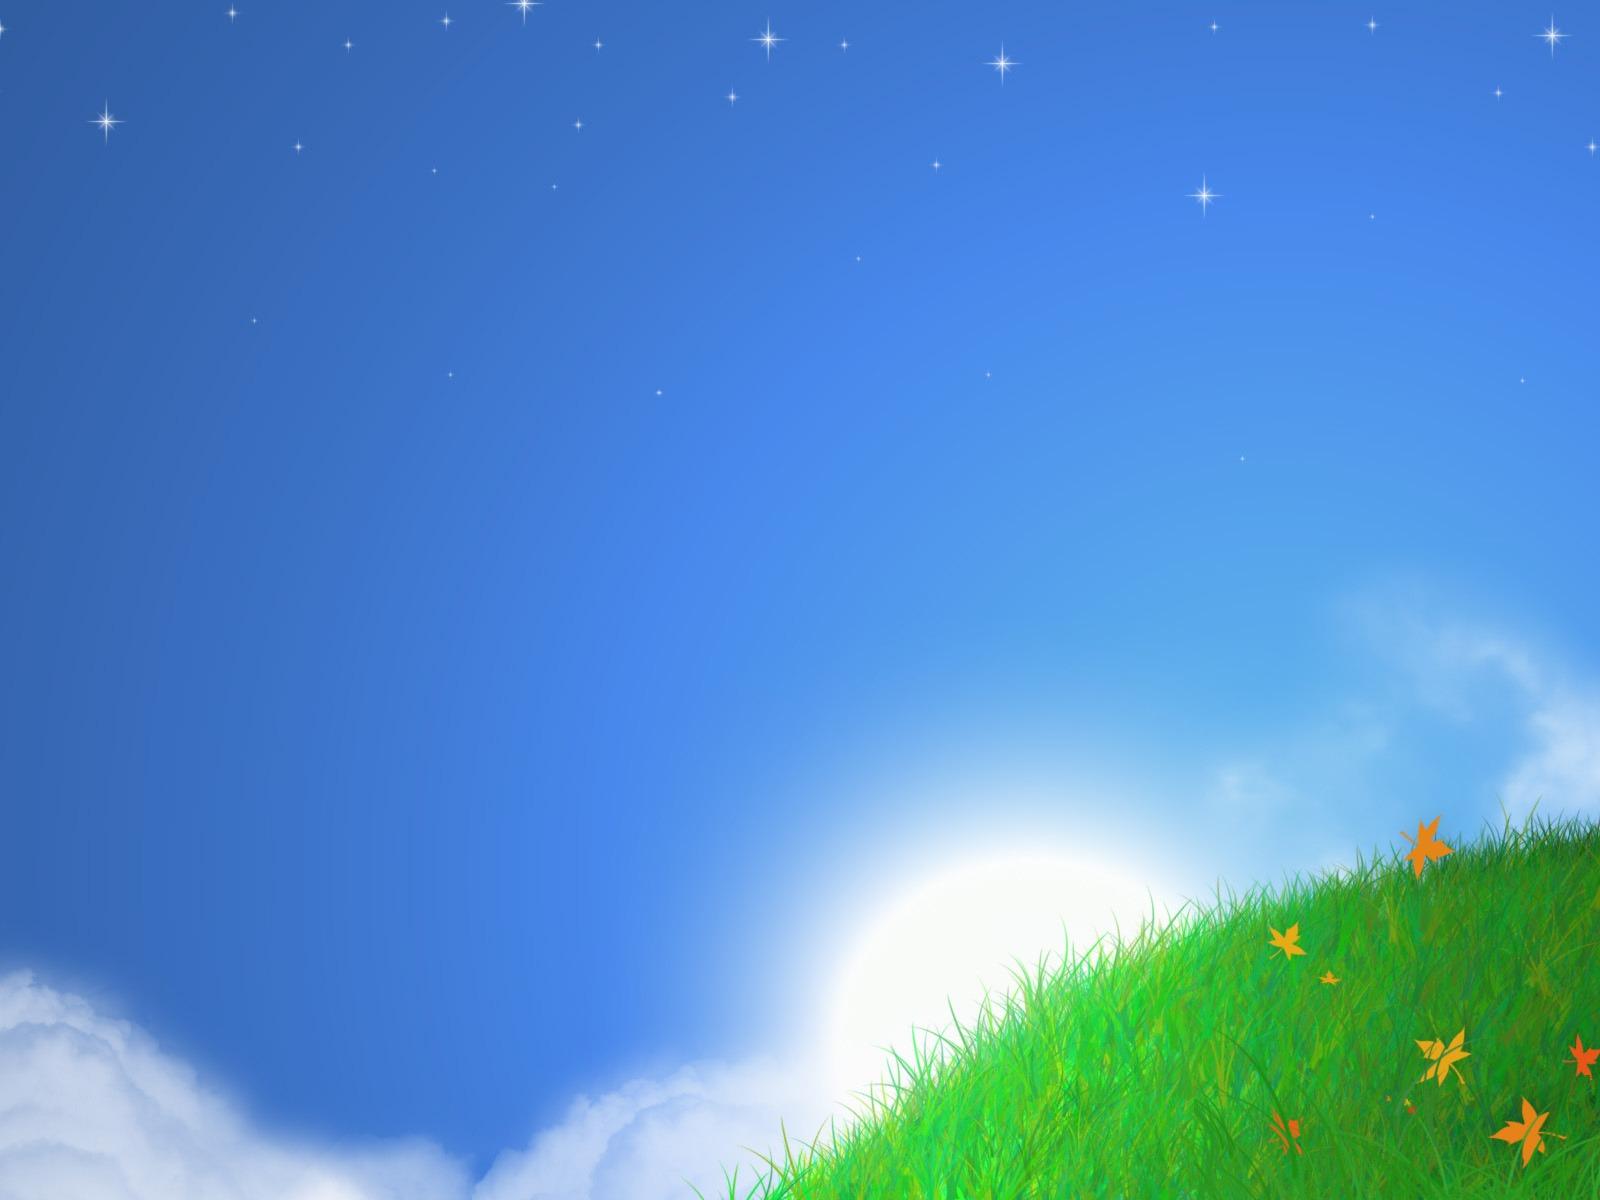 Artistic Sunrise PPT Backgrounds